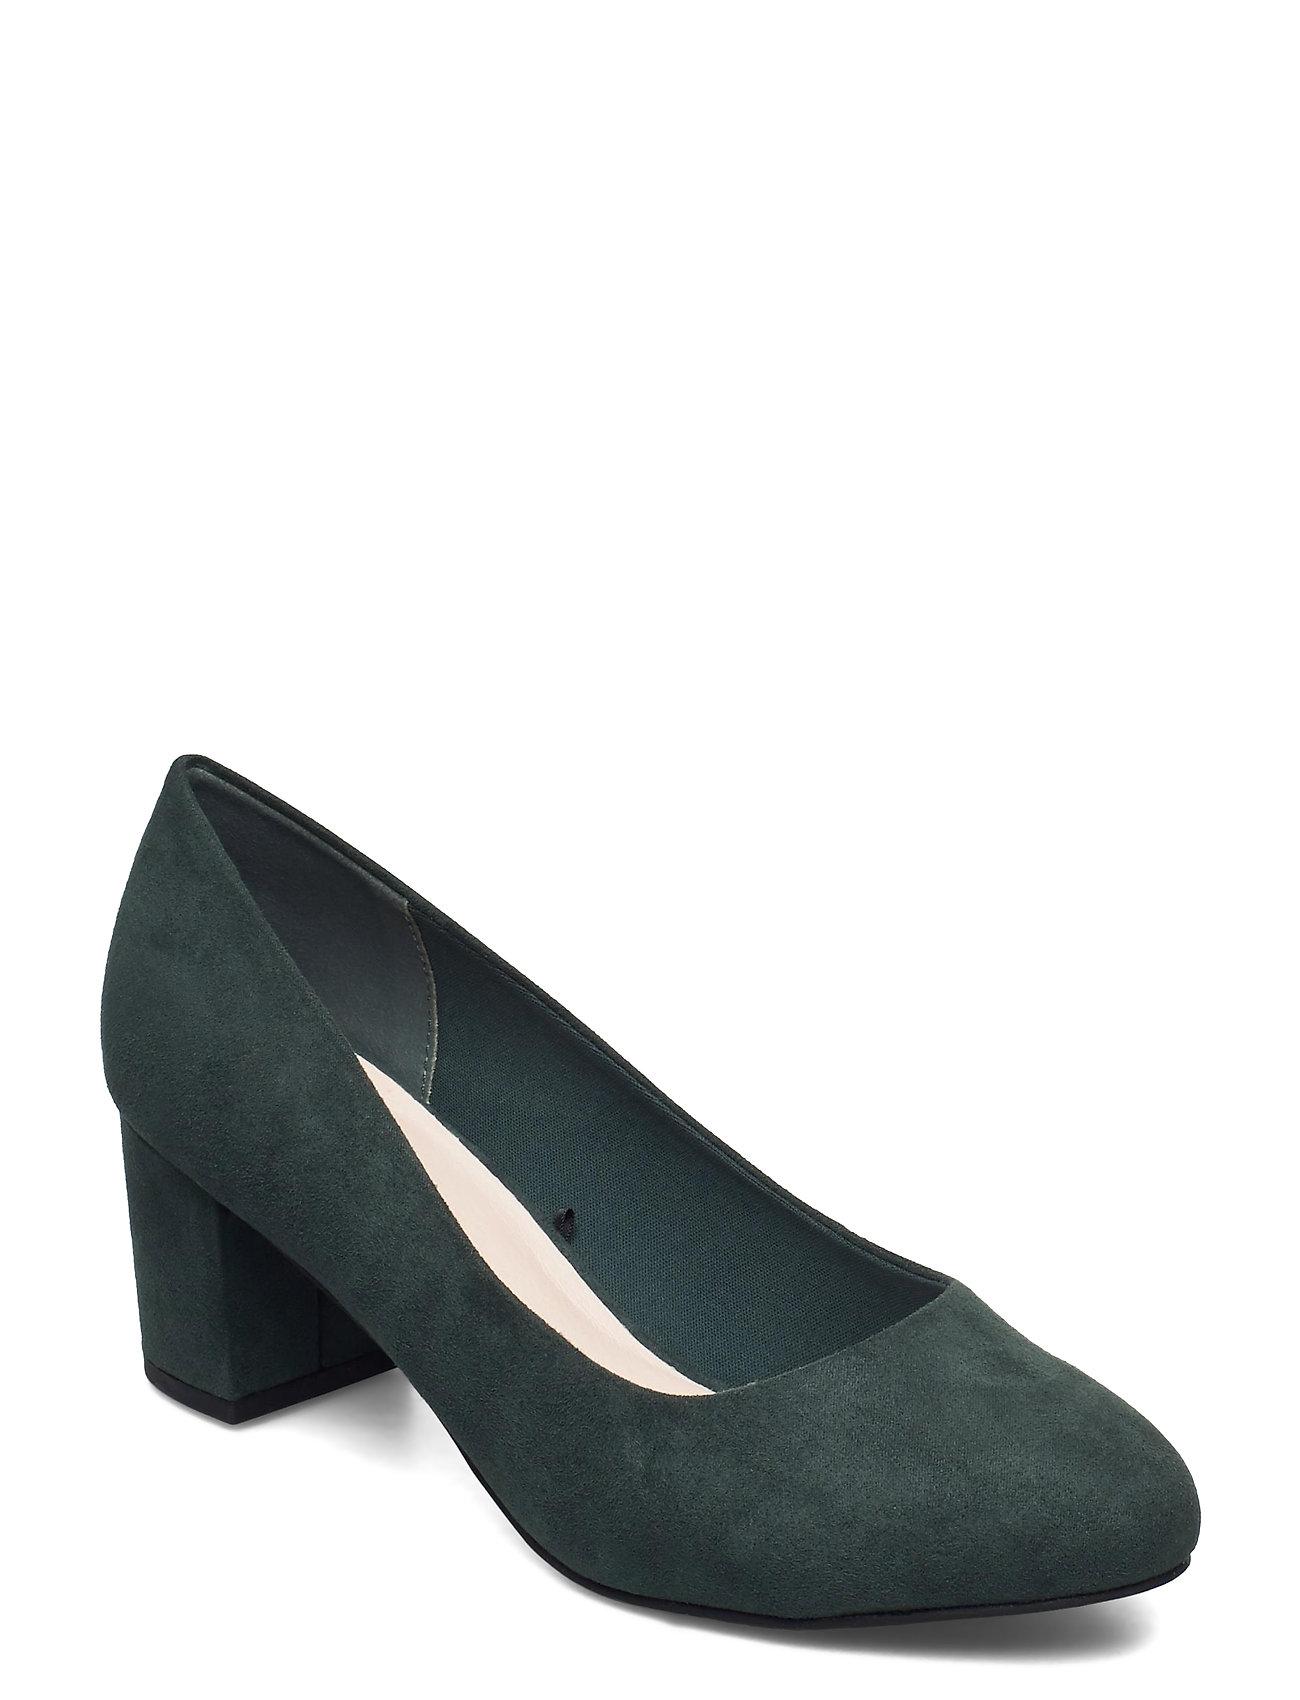 Biablanche Blok Heel Pump Wf Shoes Heels Pumps Classic Grøn Bianco